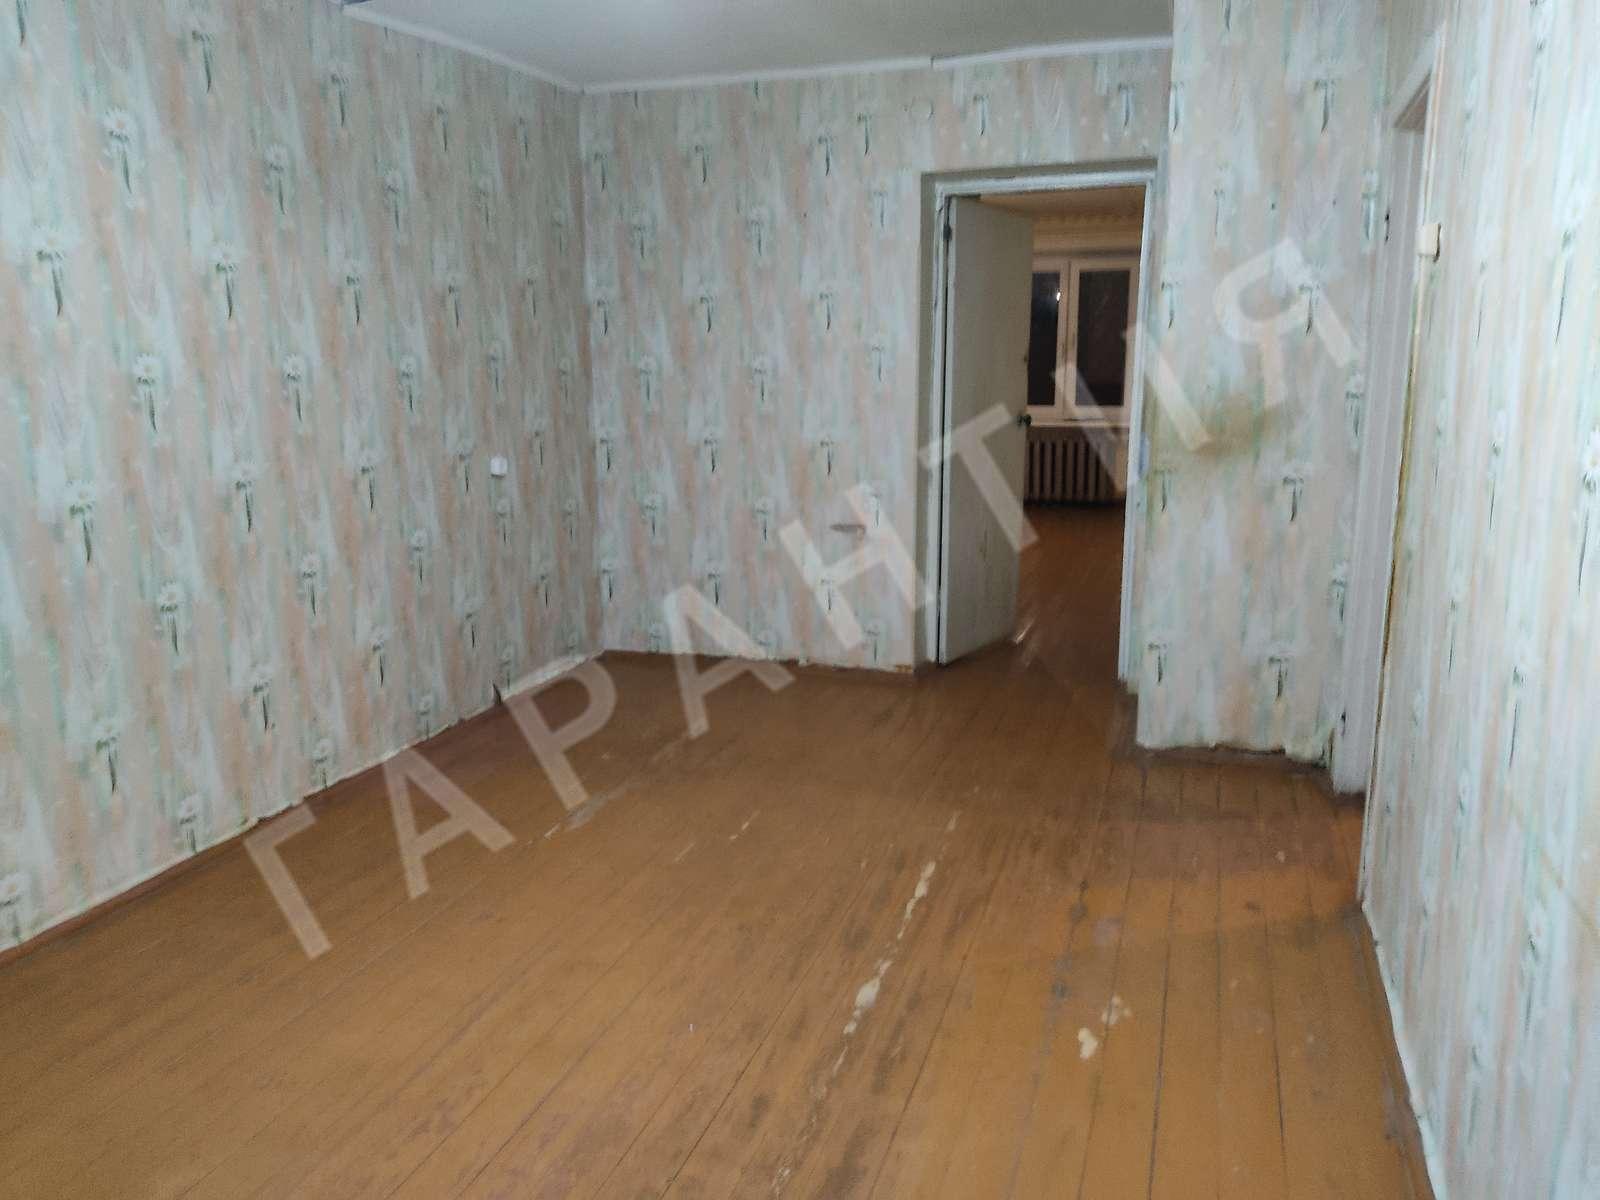 Вологда, 1 микрорайон ГПЗ-23, Щетинина улица, дом 21